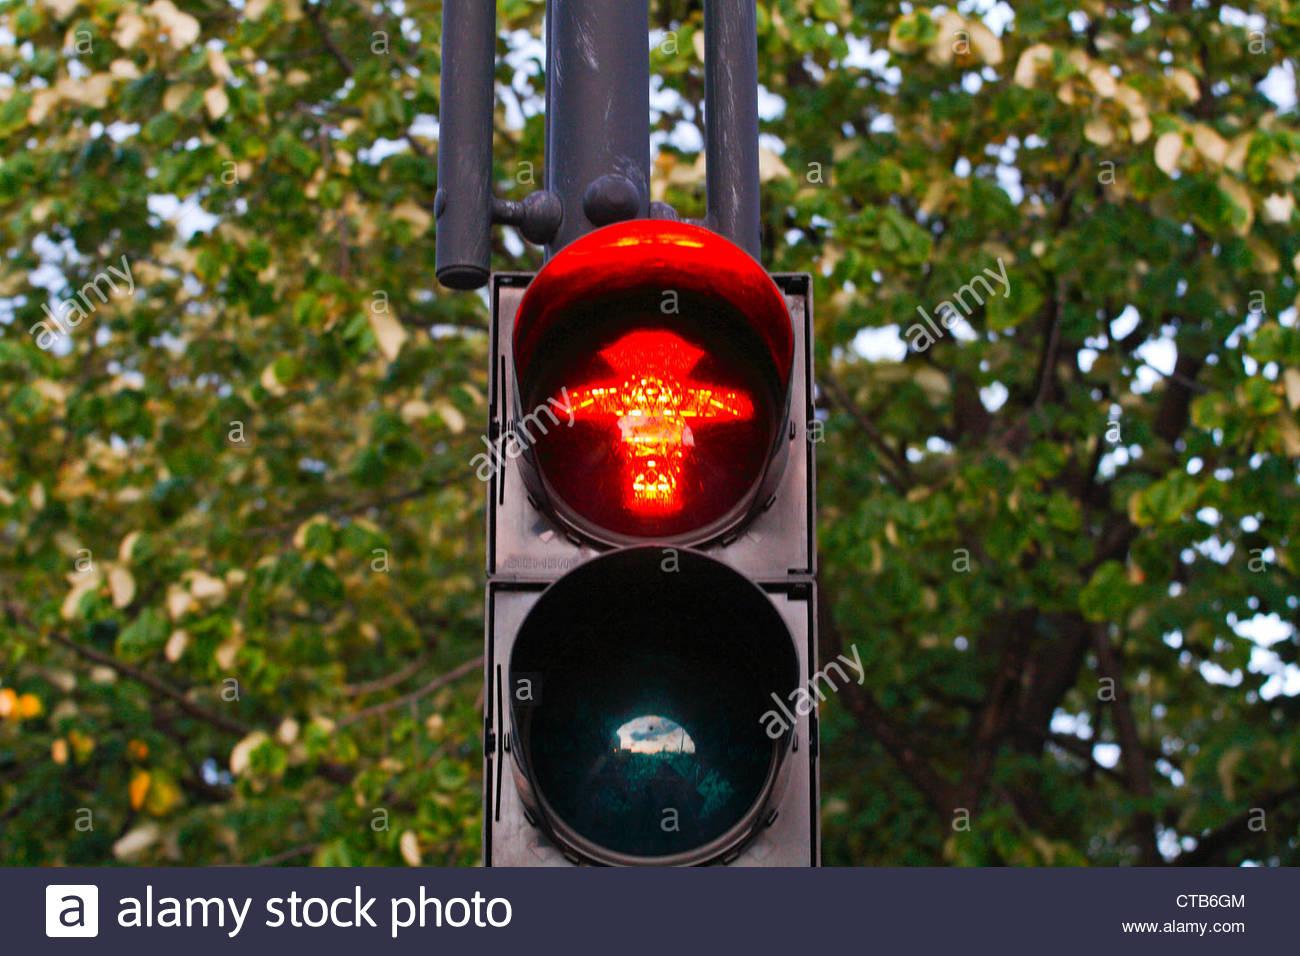 Ampelmännchen, typical traffic light in East Berlin.Pedestrian red light. - Stock Image